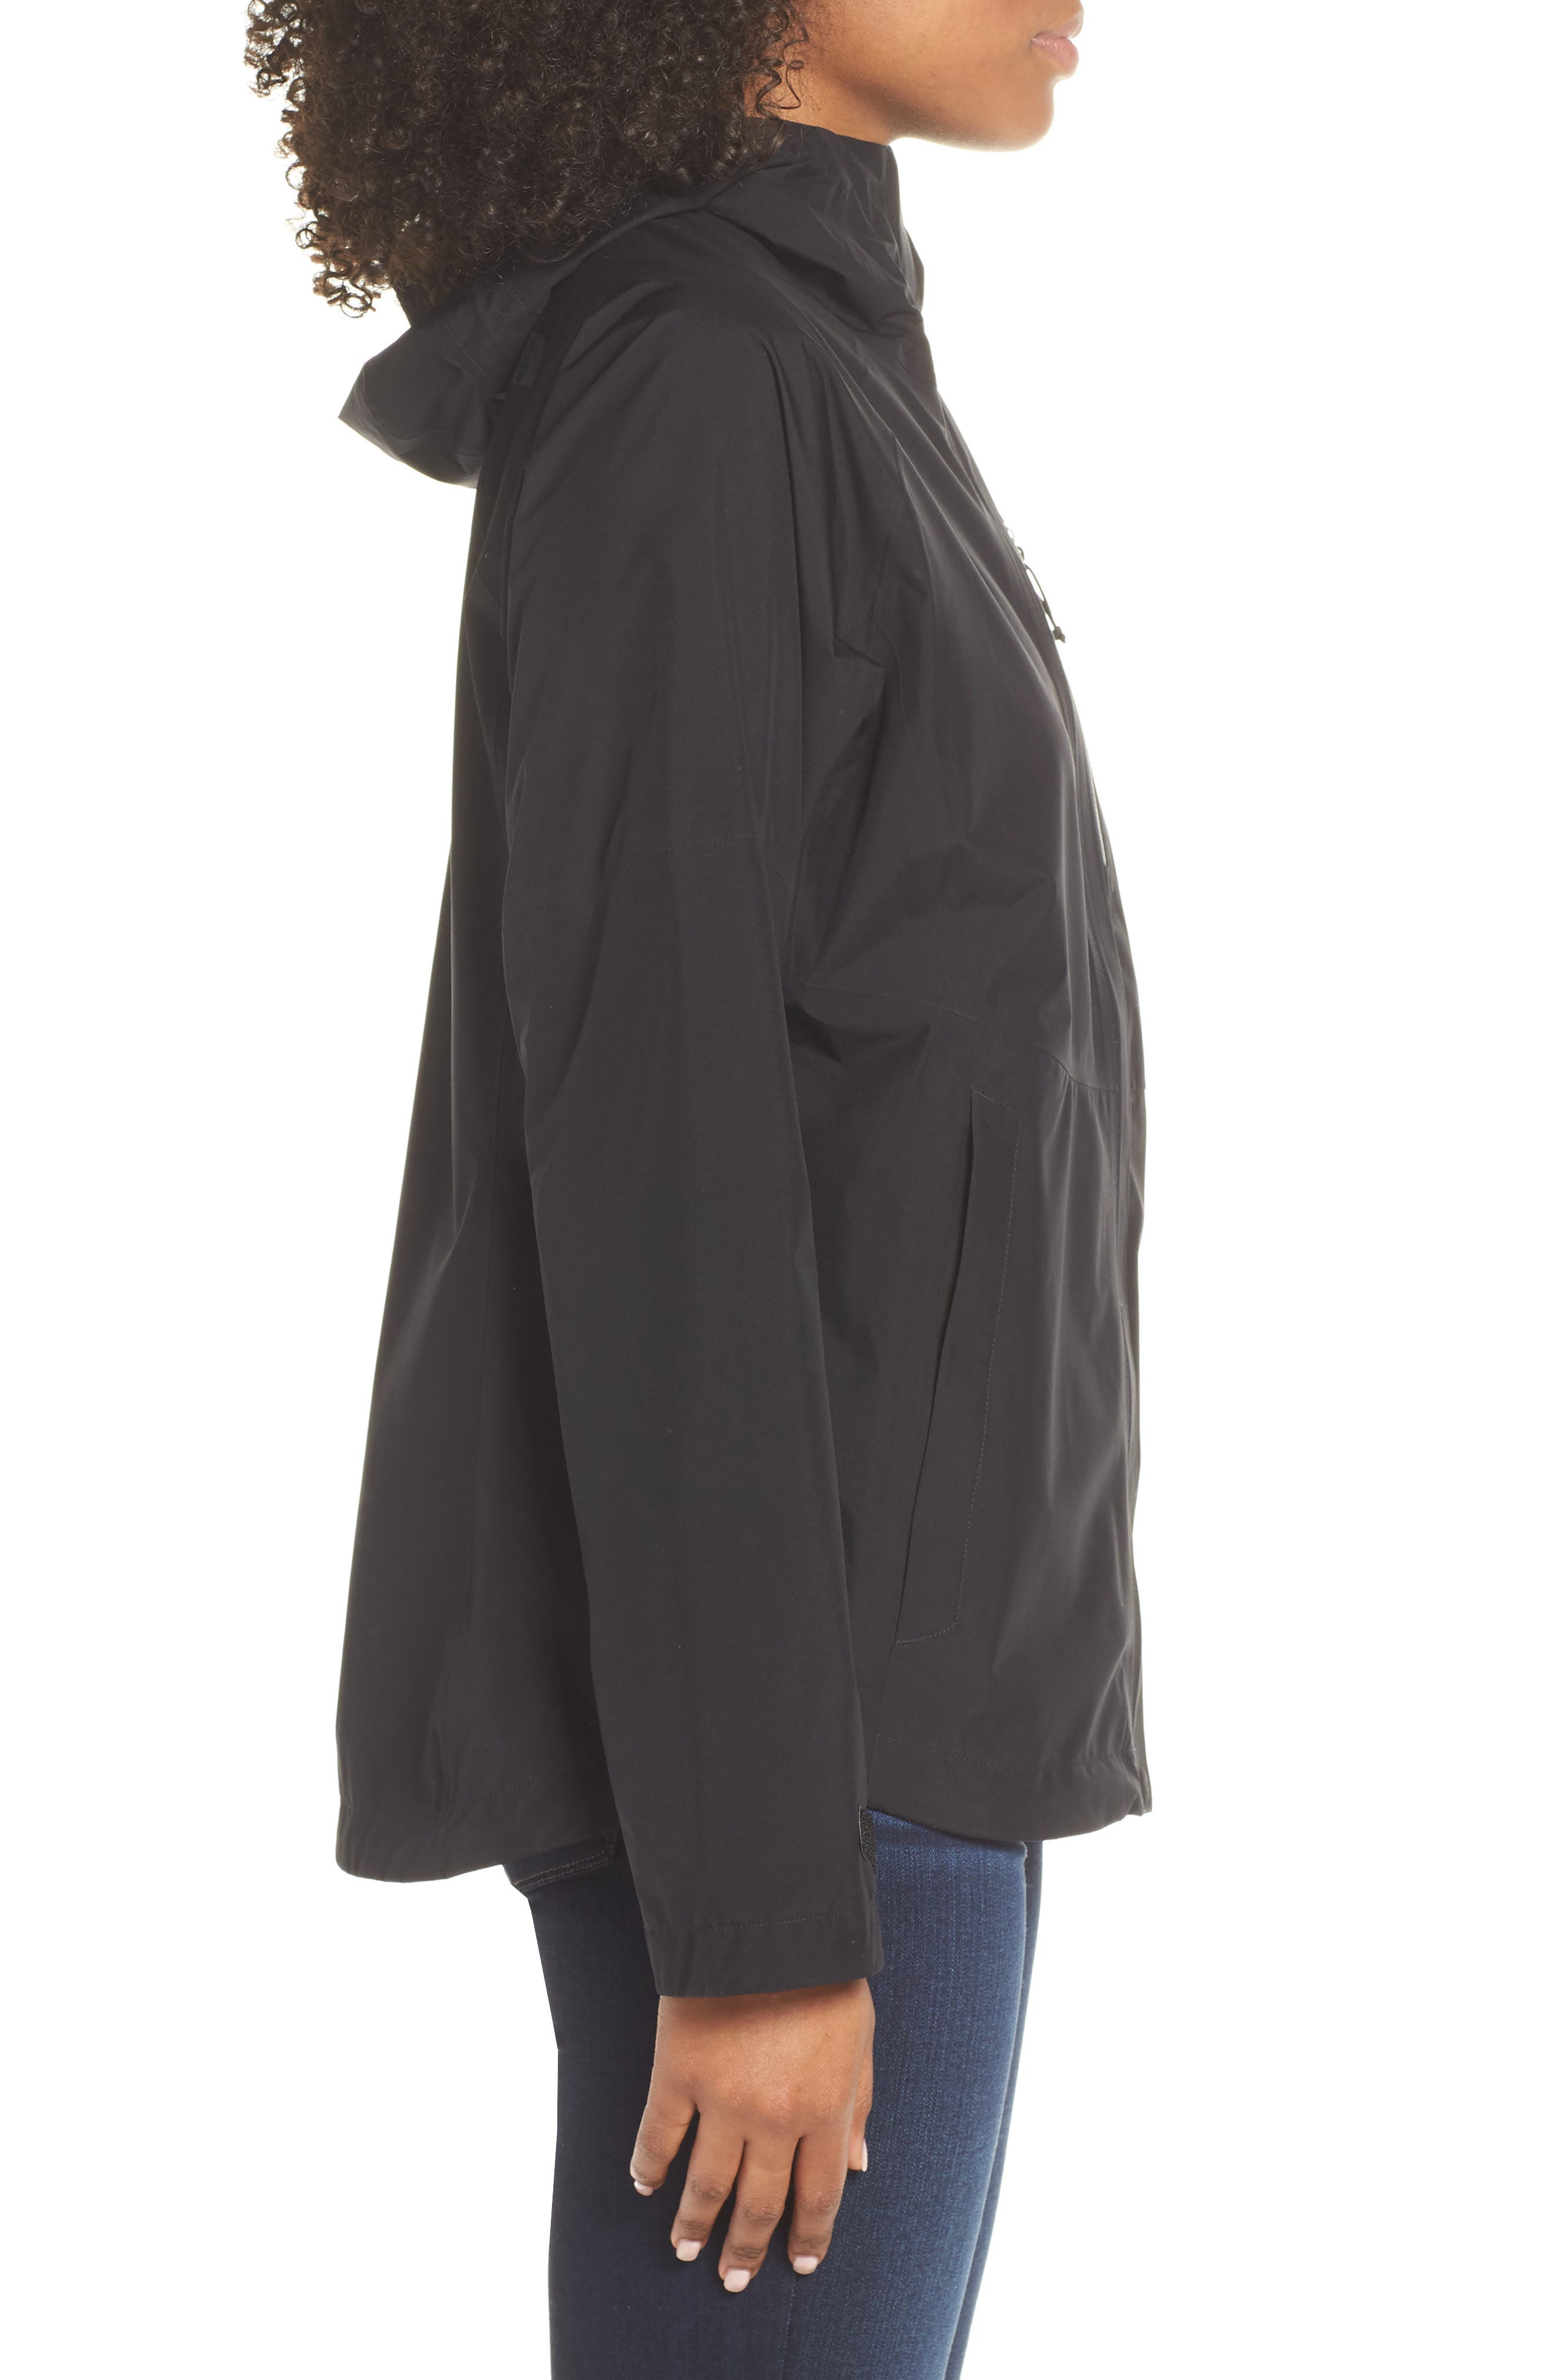 THE NORTH FACE, Dryzzle Hooded Rain Jacket, Alternate thumbnail 4, color, TNF BLACK